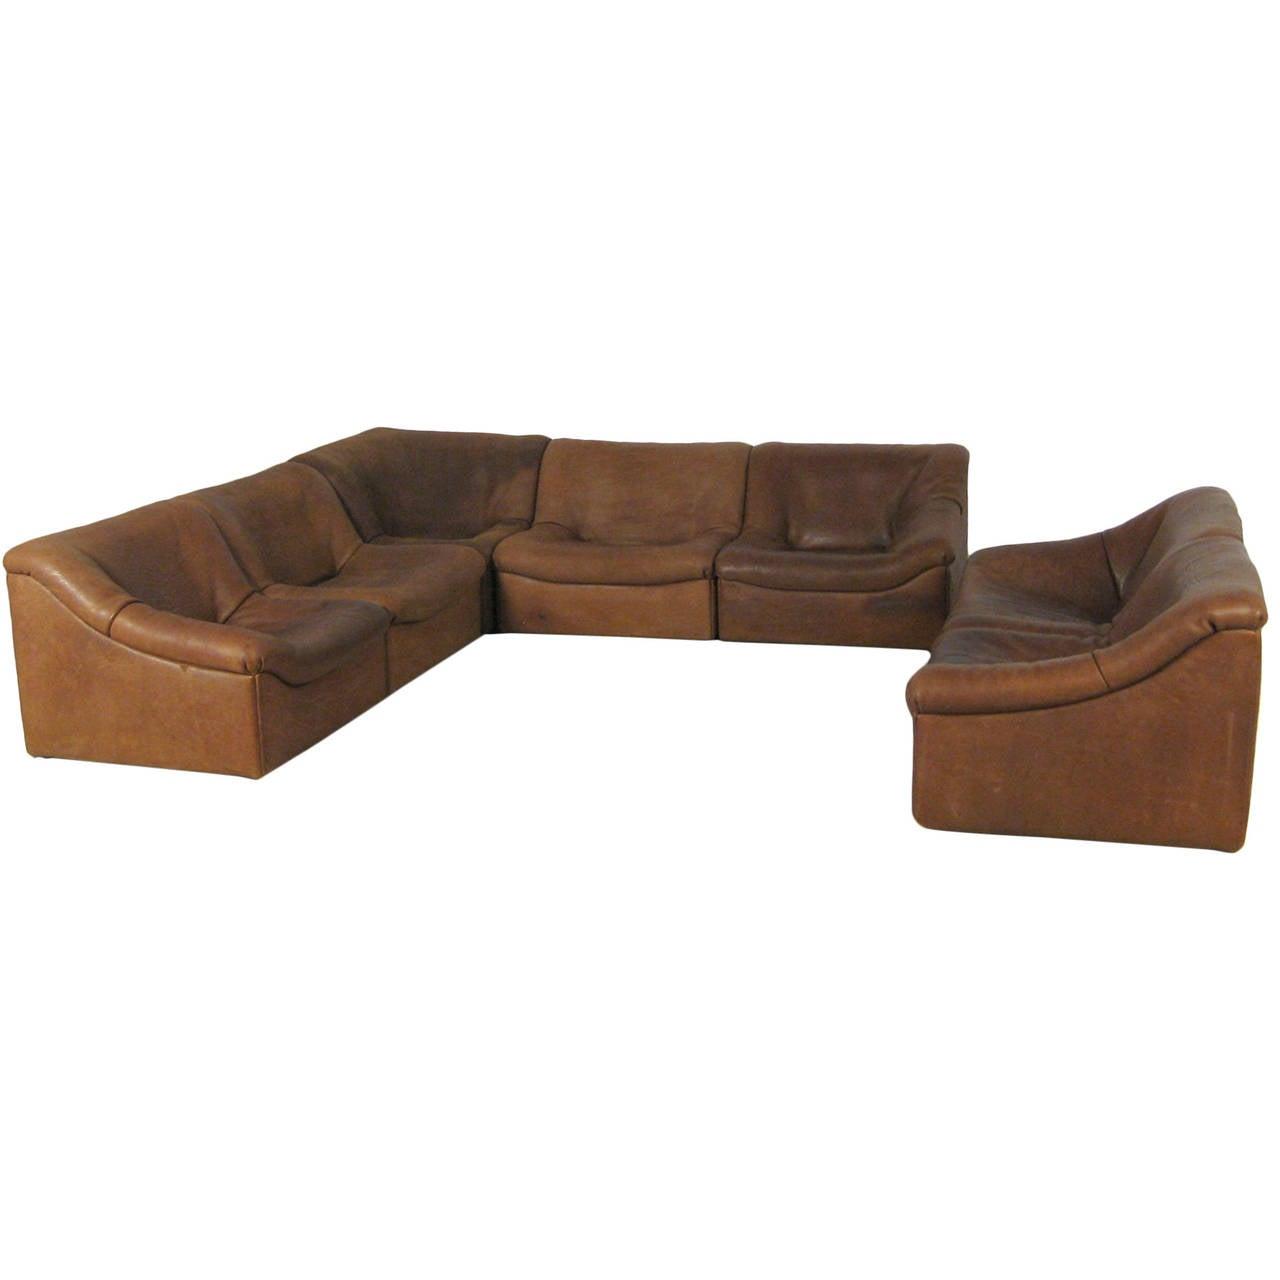 7 Section Buffalo Leather Desede Sofa 1